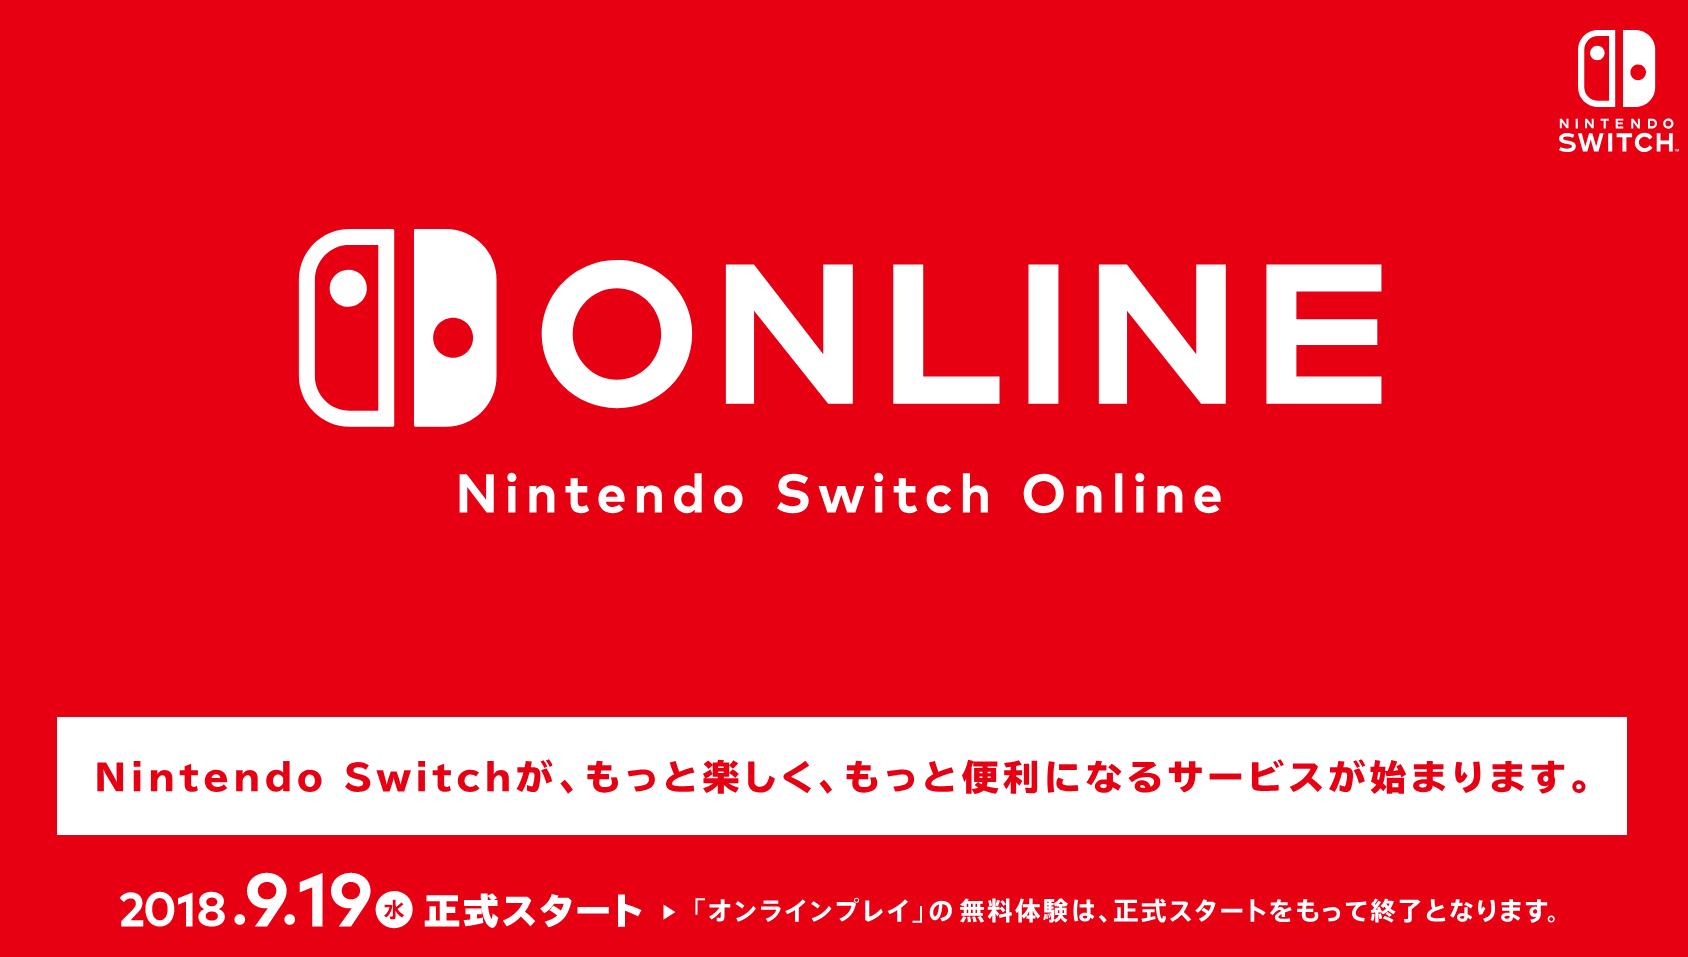 Nintendo Switch Onlineの課金サービス、9月19日から正式にスタート!